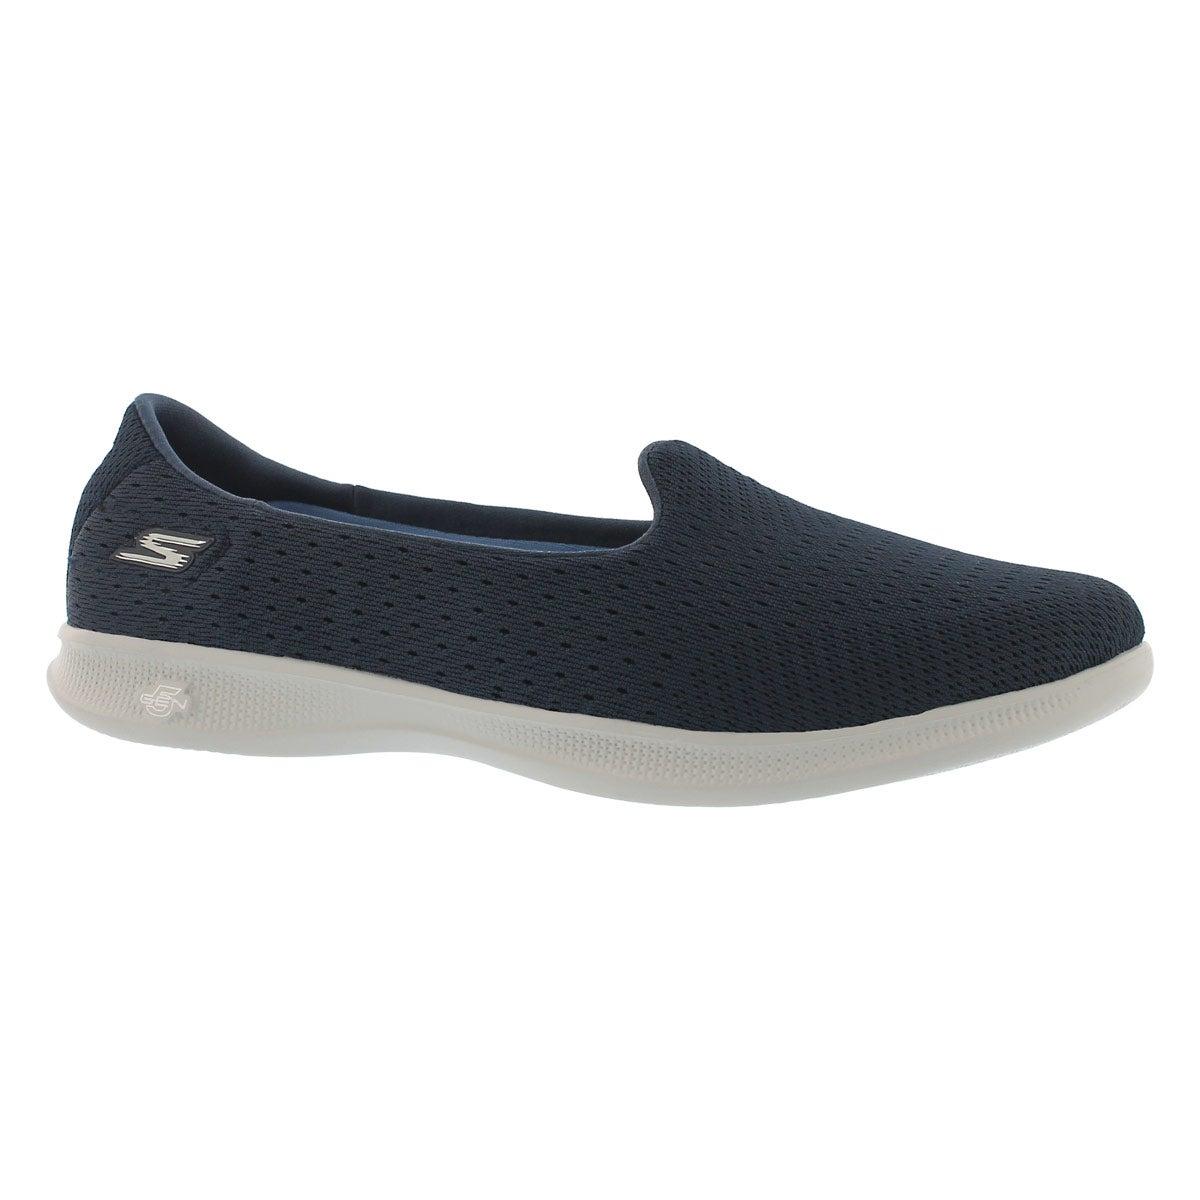 Women's GO STEP LITE ORIGIN navy walking shoes